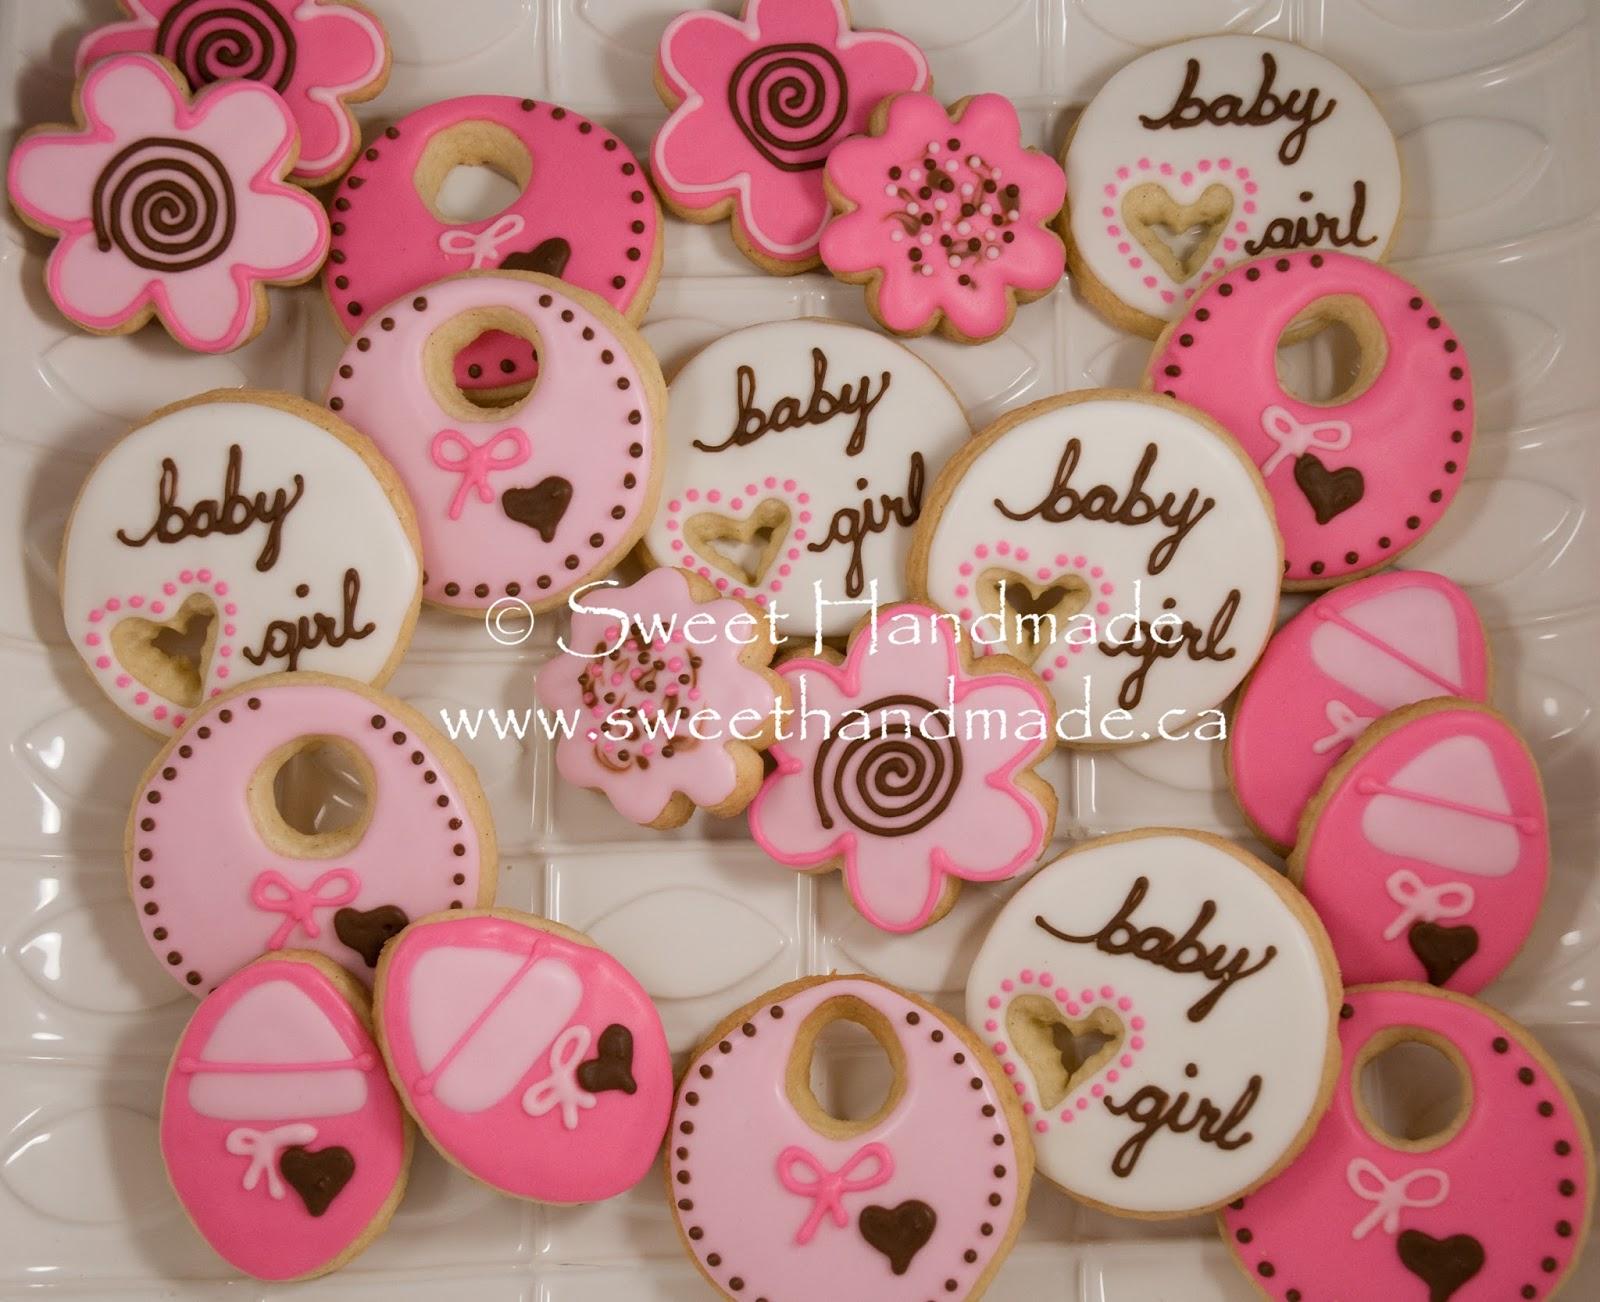 Baby Shower Cookie Images ~ Sweet handmade cookies baby shower cookies